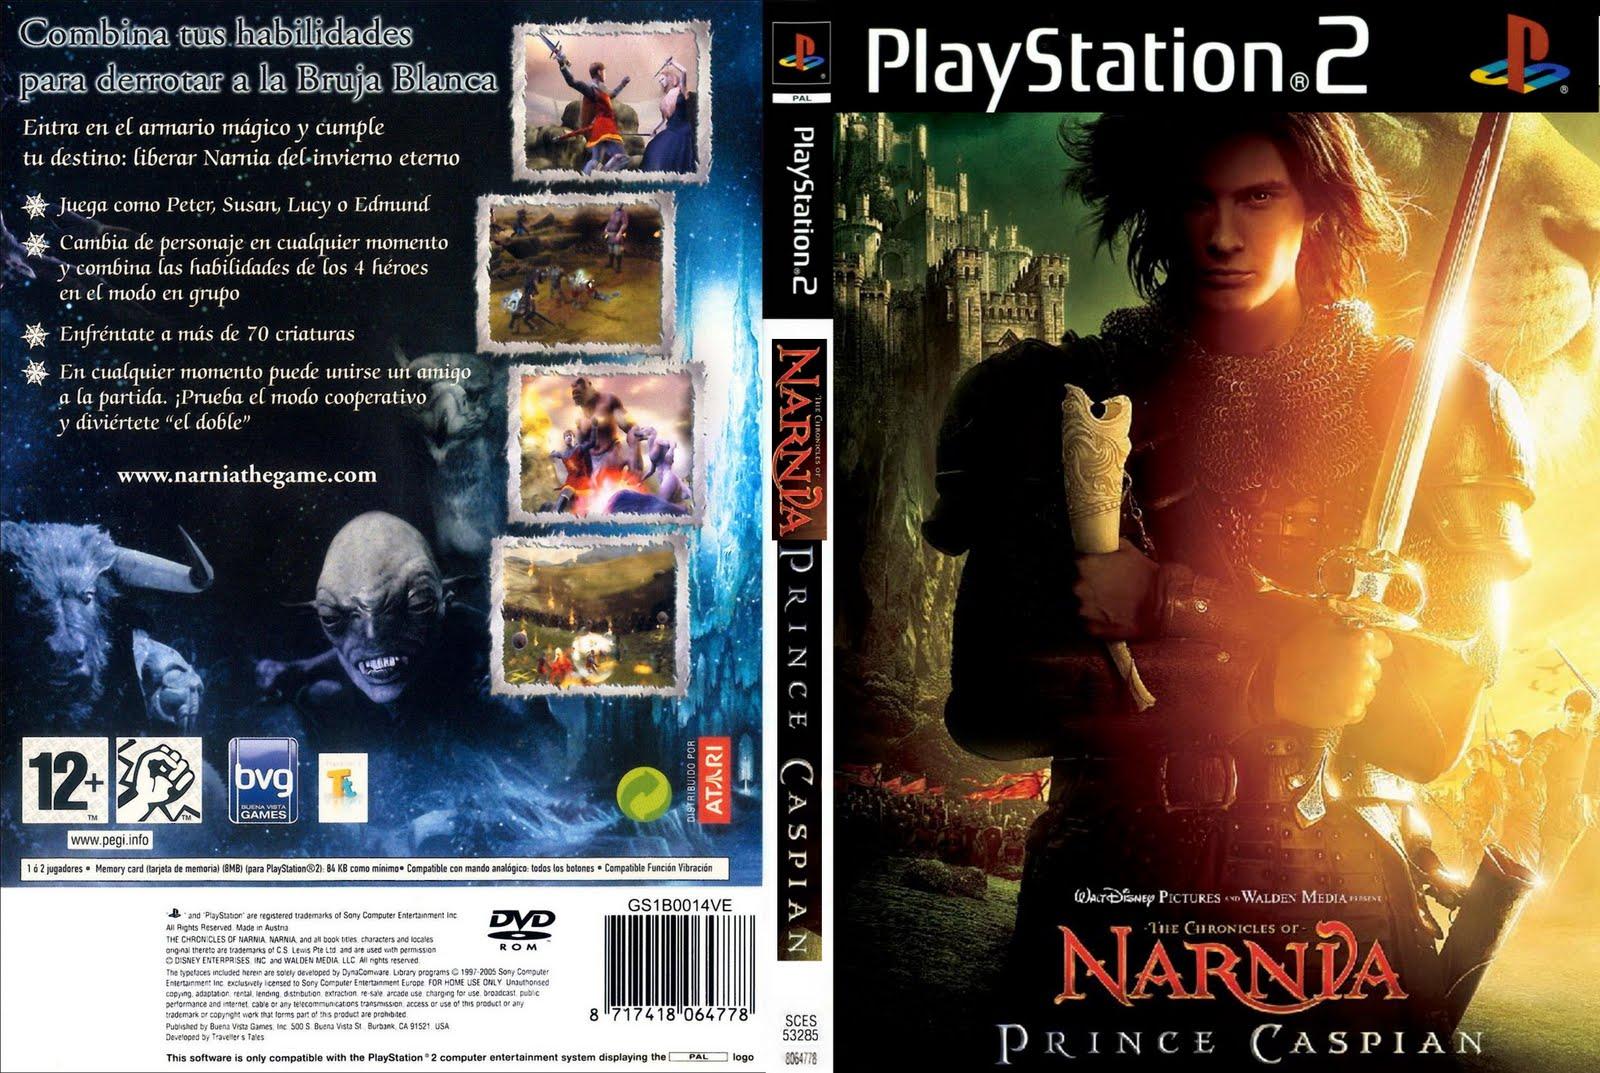 http://2.bp.blogspot.com/_QedrAkGSUz8/S8JWpyTGLwI/AAAAAAAADVQ/S_q_Kd5AKaA/s1600/The_Chronicles_Of_Narnia_-_Prince_Caspian_-_Dvd_-_Custom_-_V2_por_neflitis_%5Bps2%5D_80.jpg